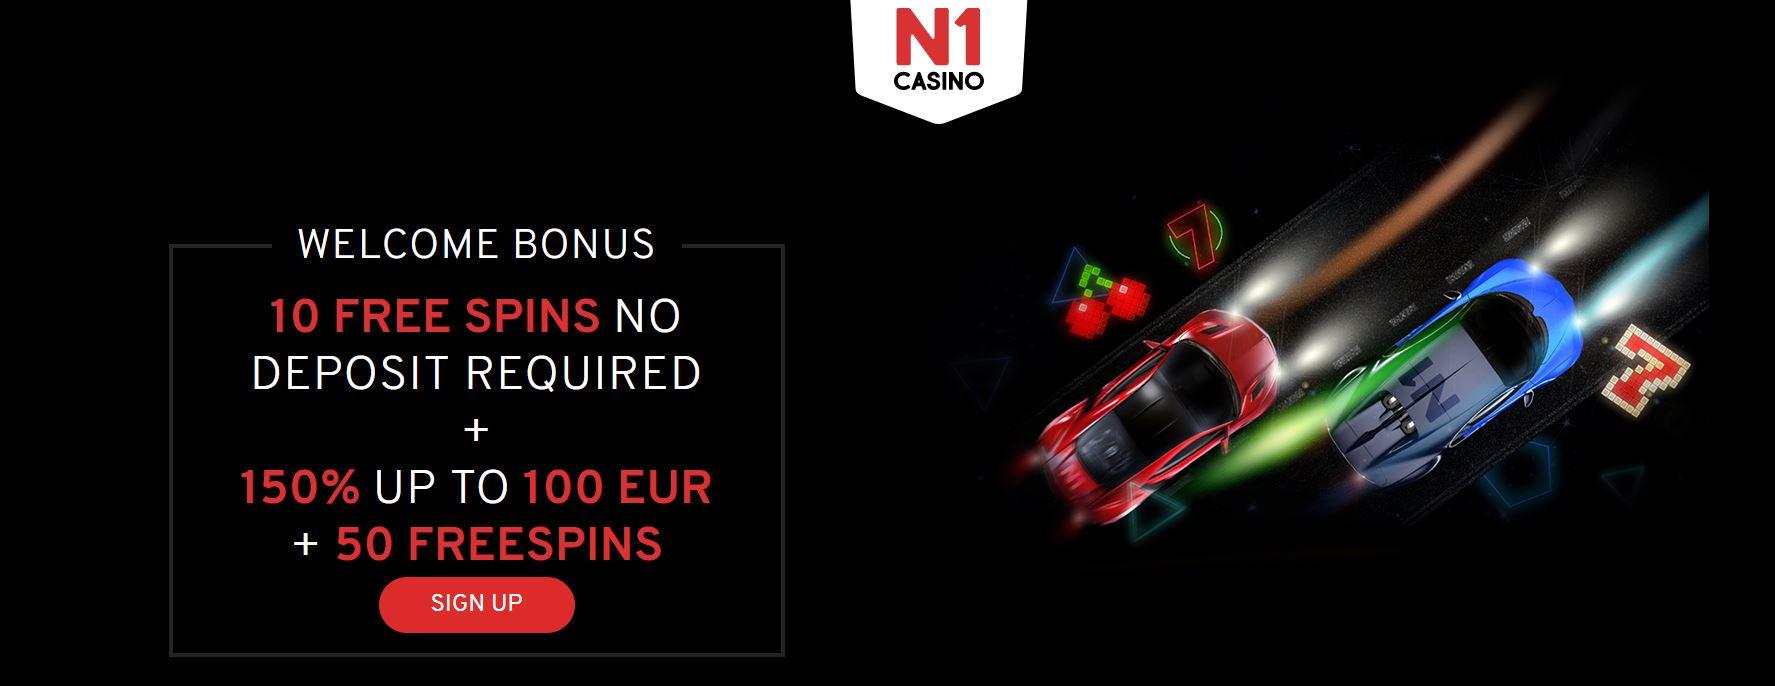 N1 Casino Review Tekst image